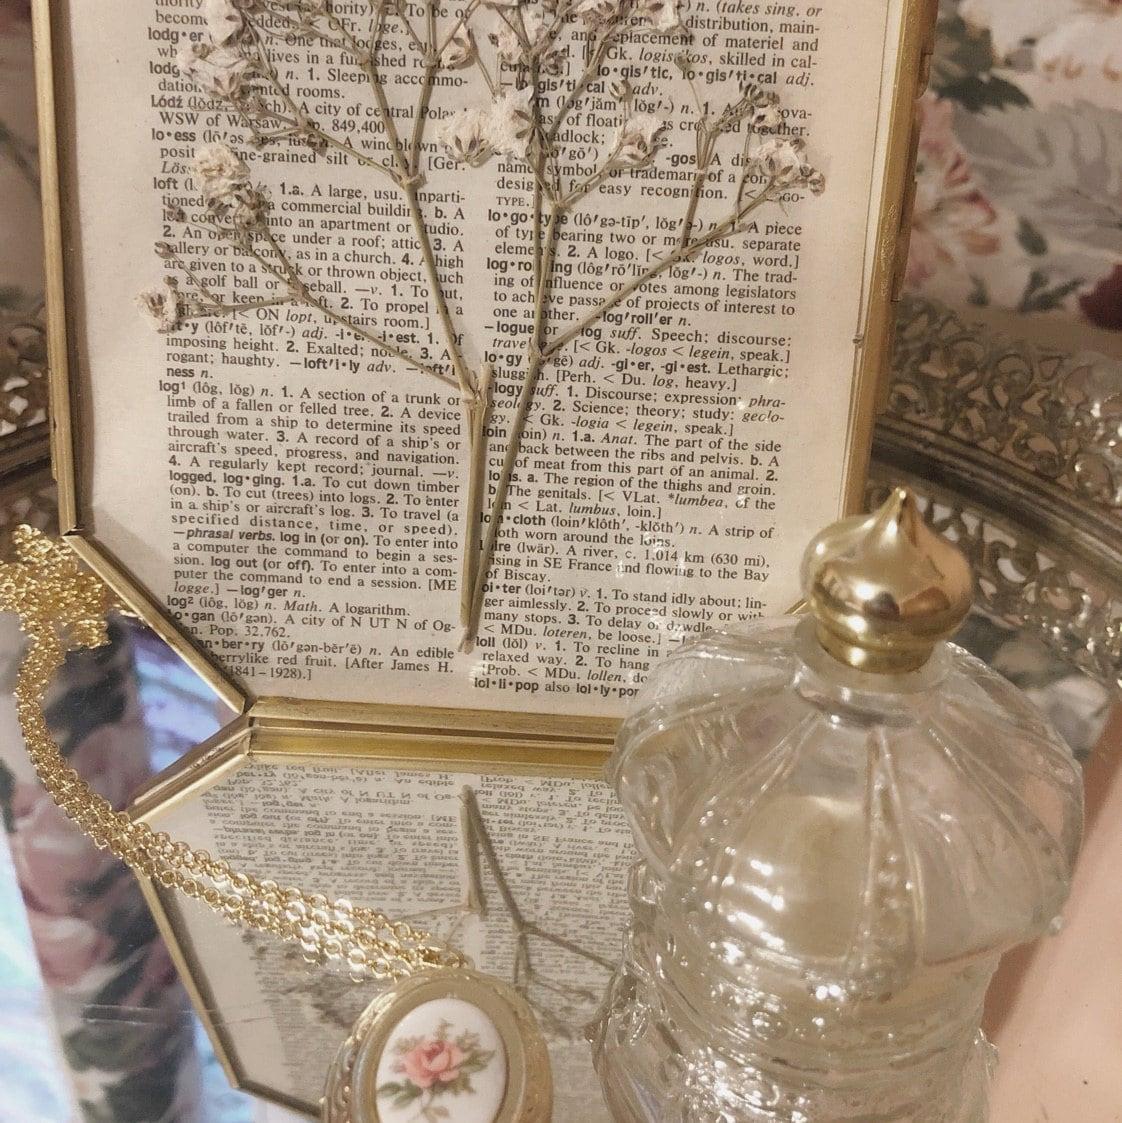 Marissa Schulrz added a photo of their purchase